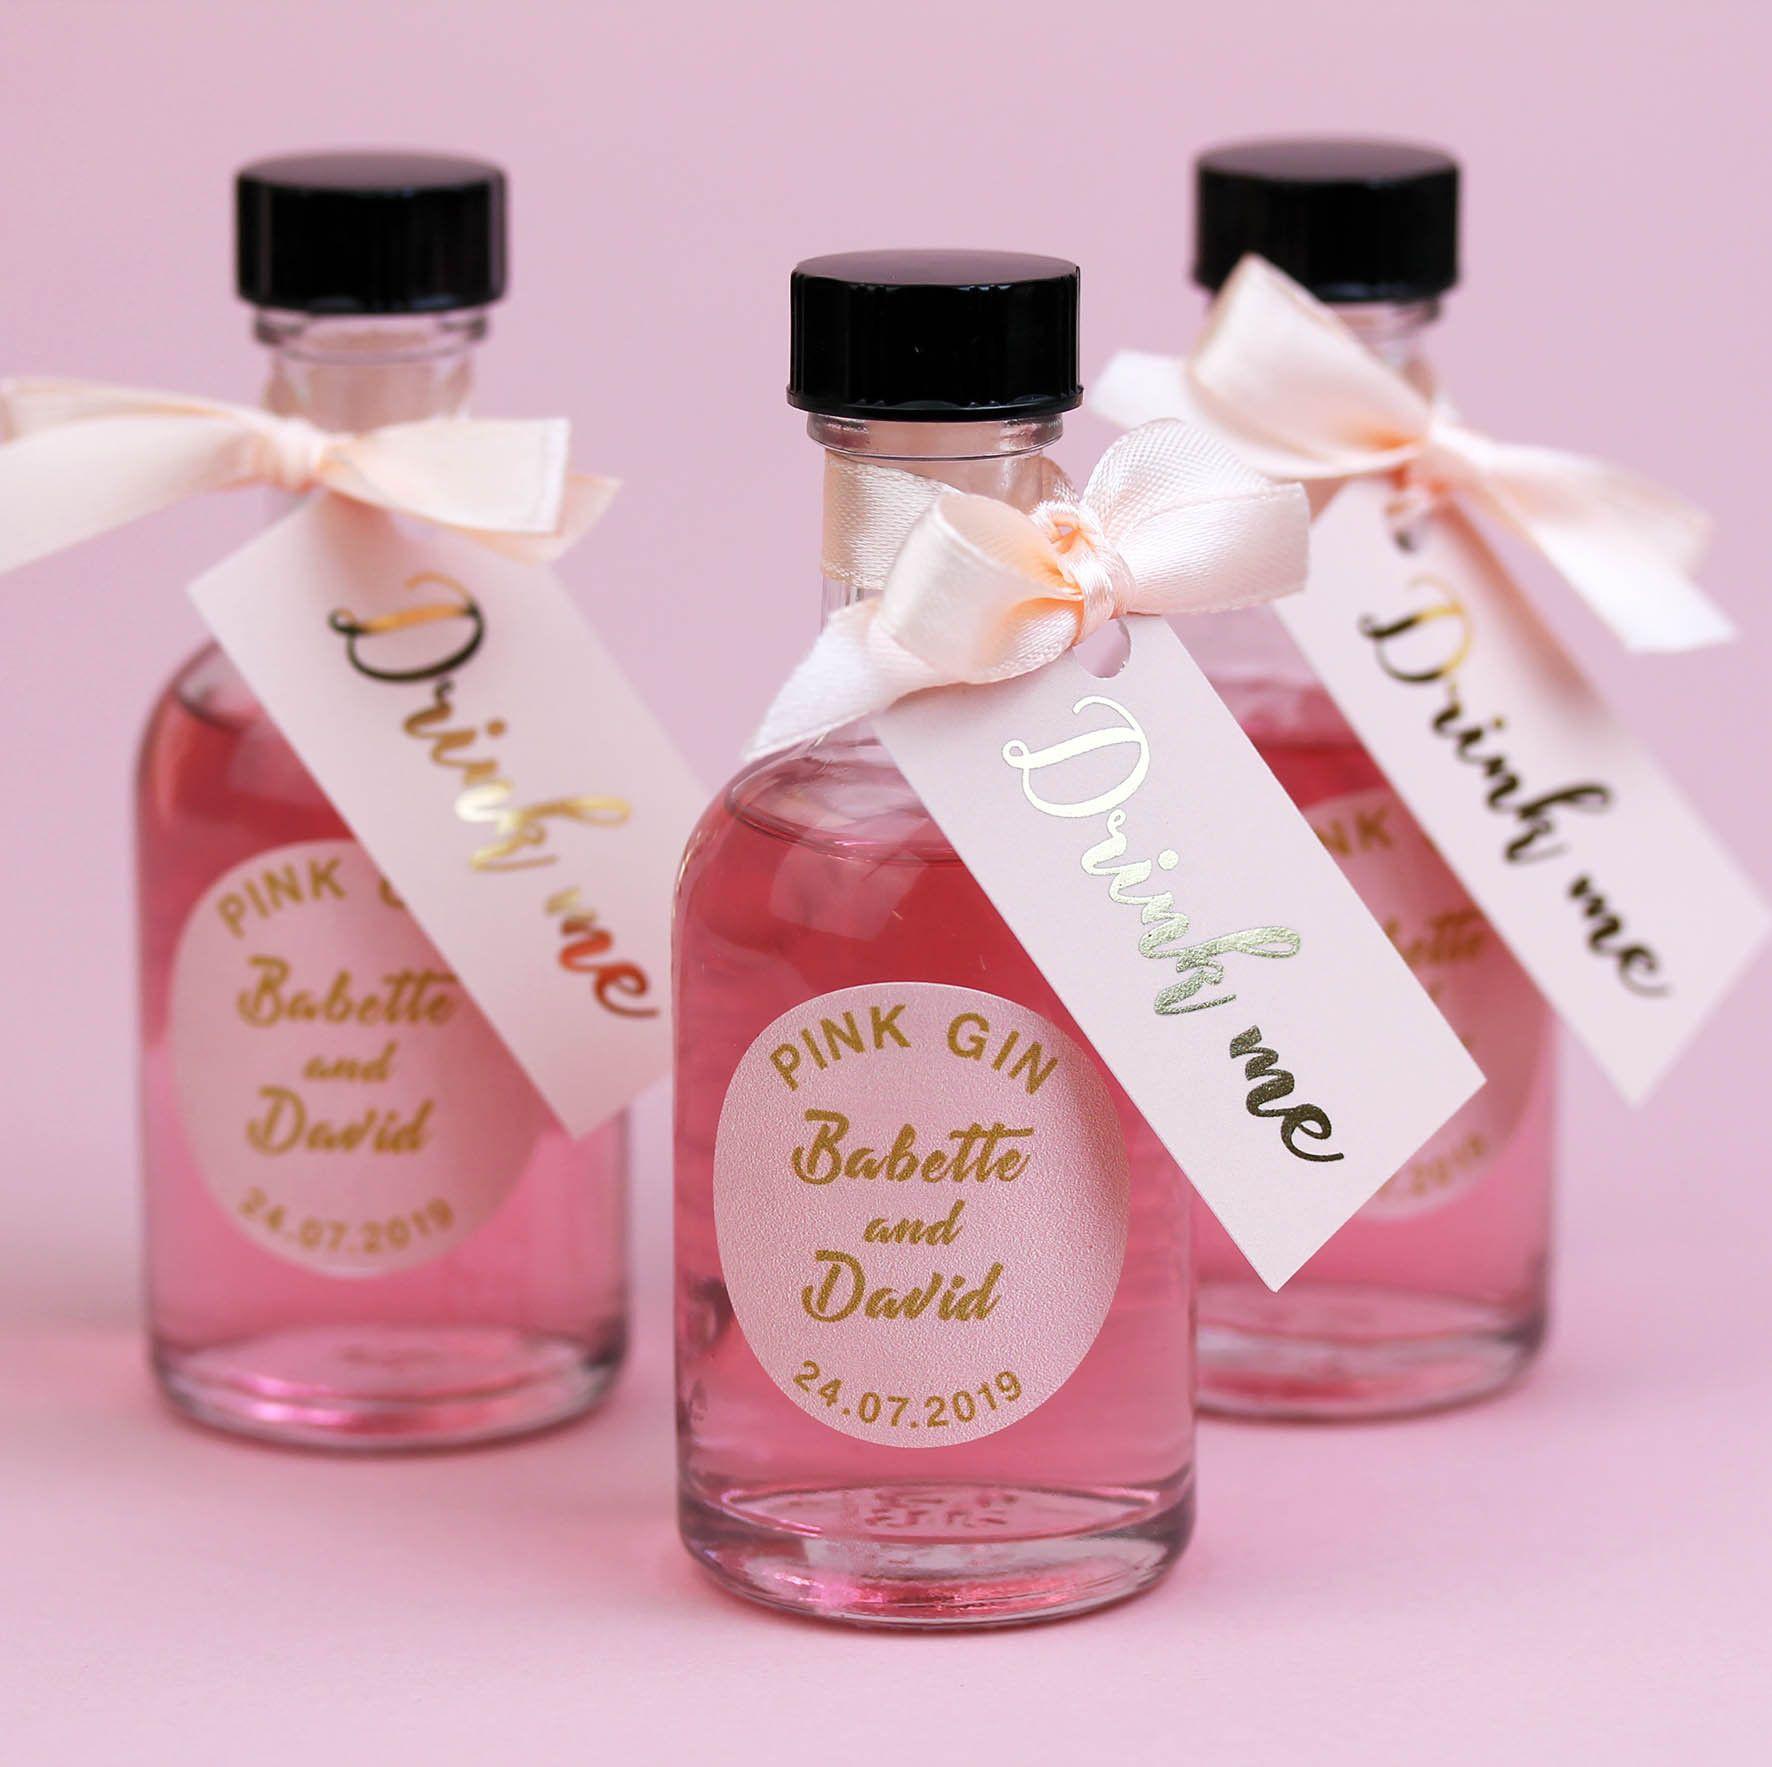 Personalized mini gin bottles make fun wedding favors!   Blush and ...